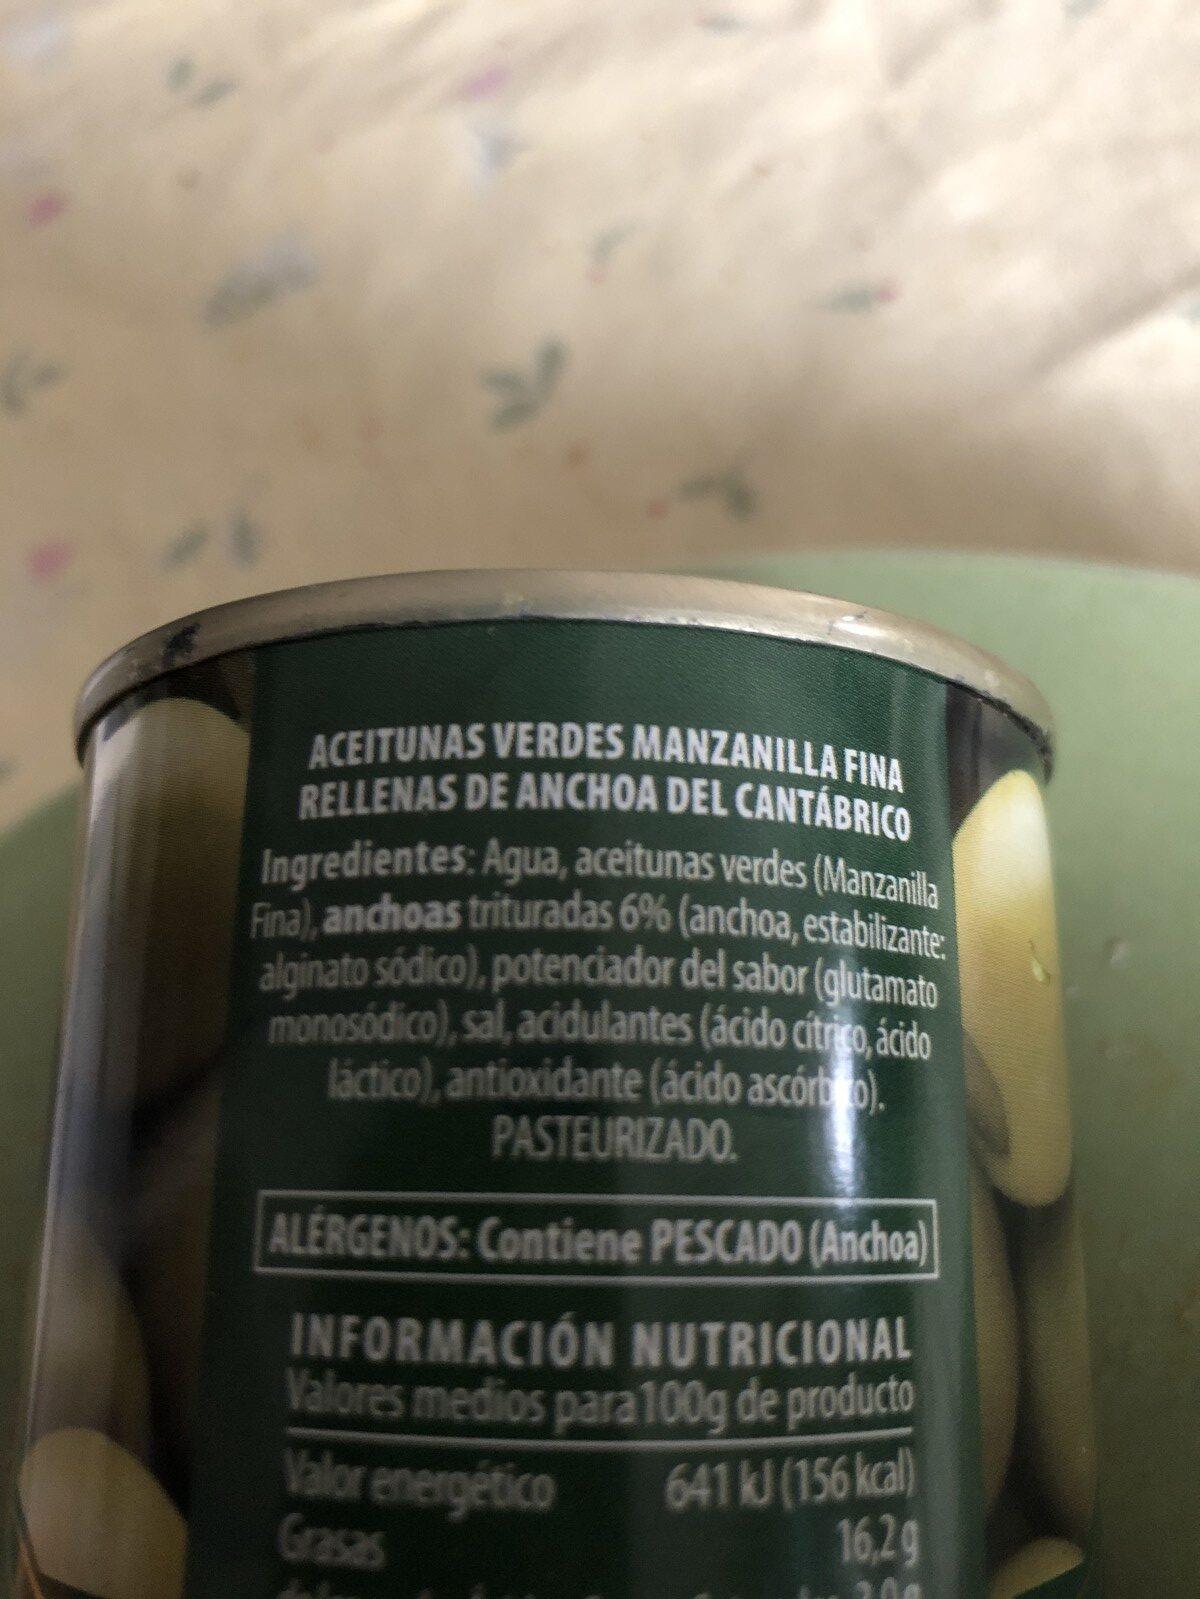 Aceitunas verdes rellenas de anchoa del Cantábrico - Ingrédients - fr